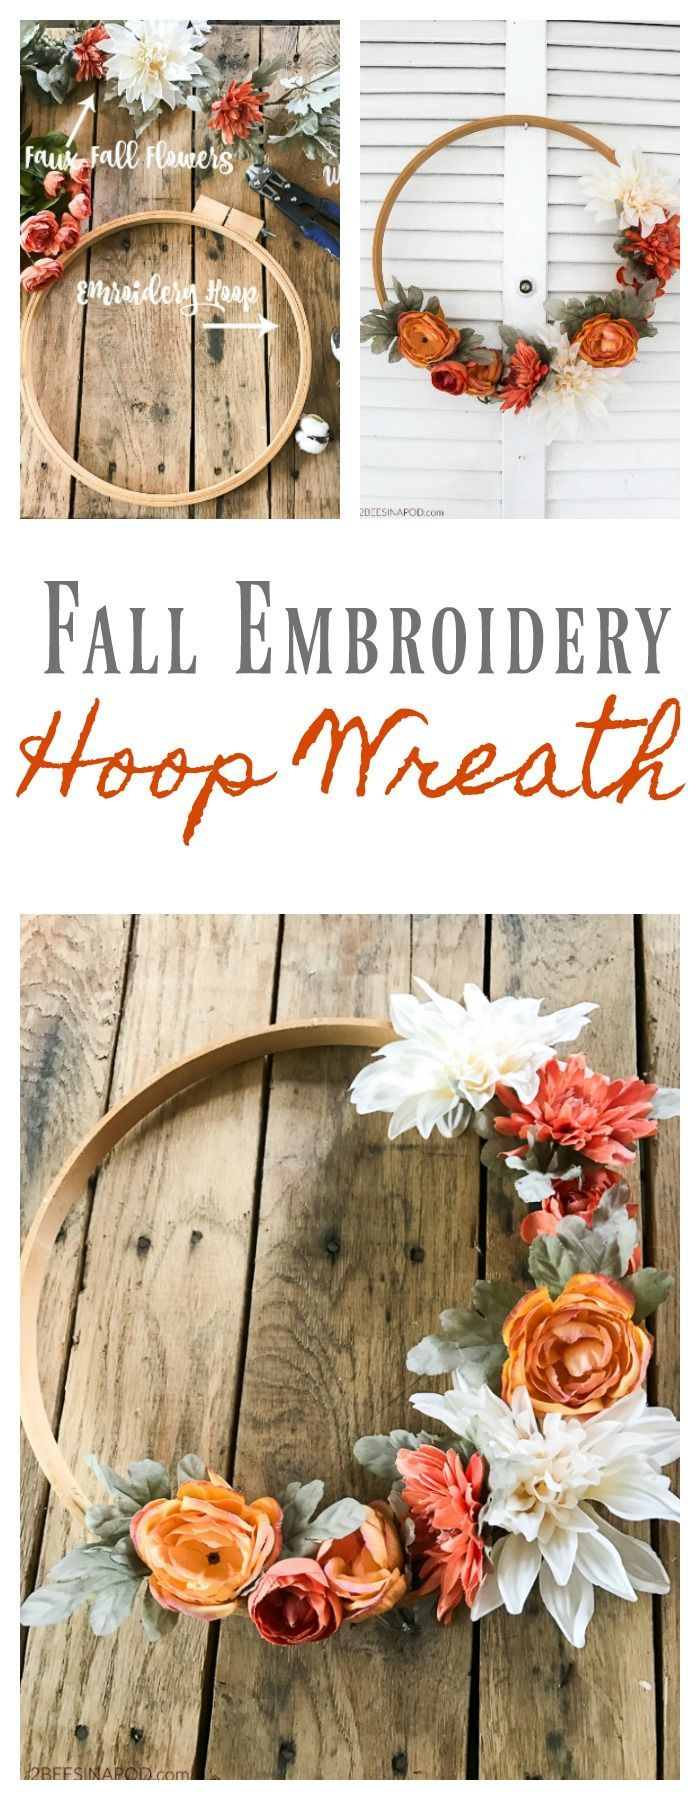 Photo of Fall Embroidery Hoop Wreath – #Embroidery #Fall #Hoop #wreath,